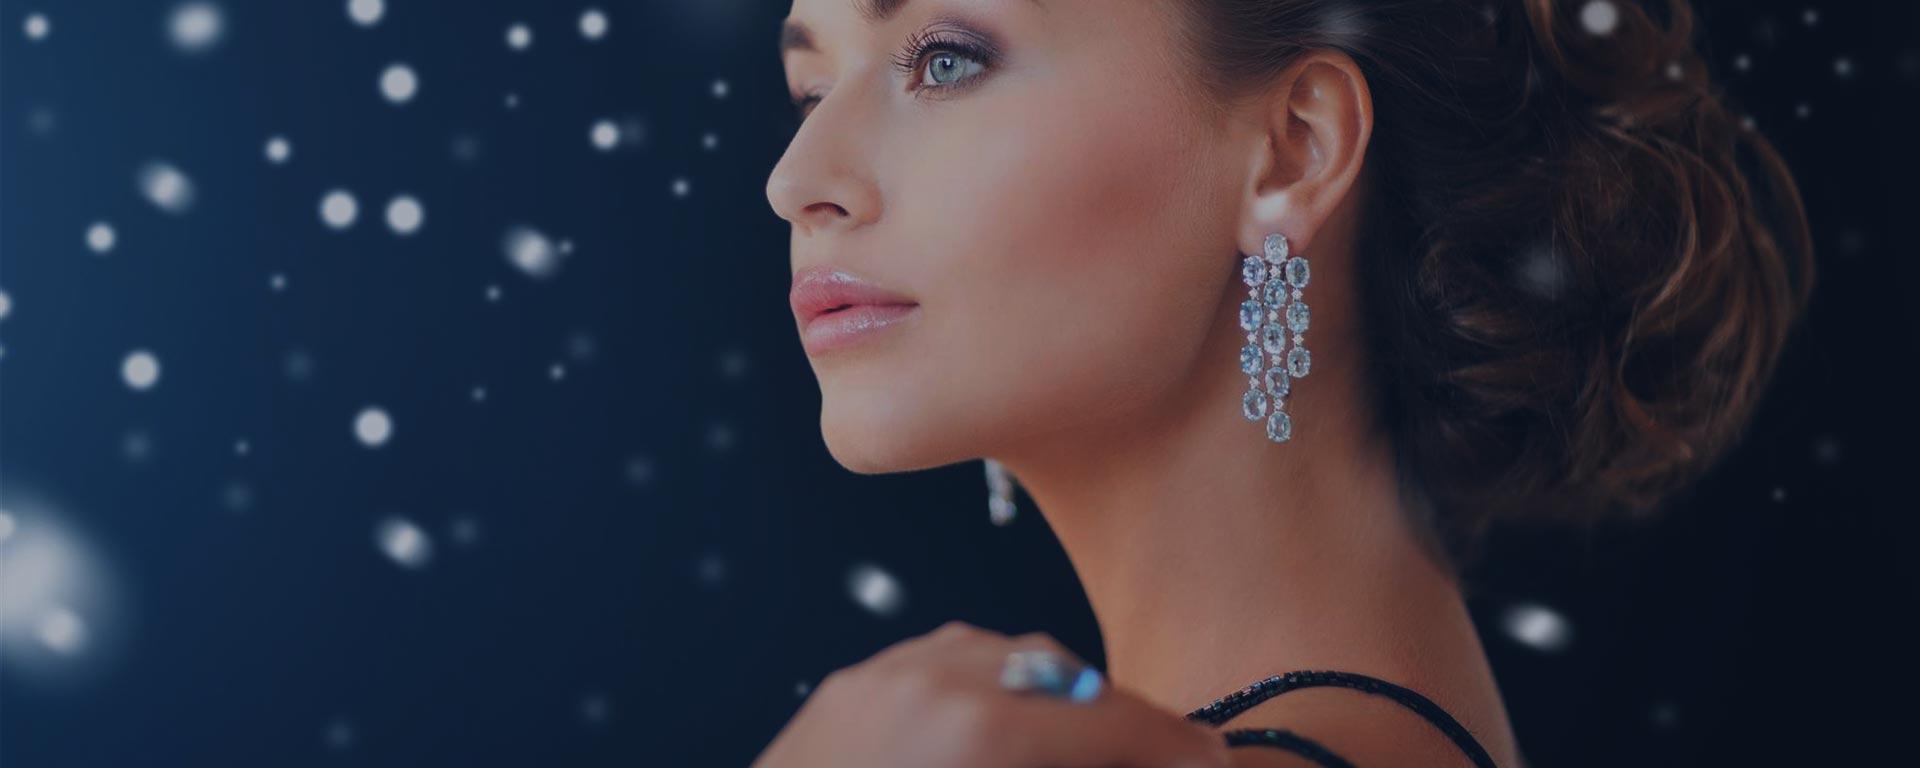 CHRISTMAS TREATSCelebrate & Create Memories with the Everlasting Gift of Jewellery